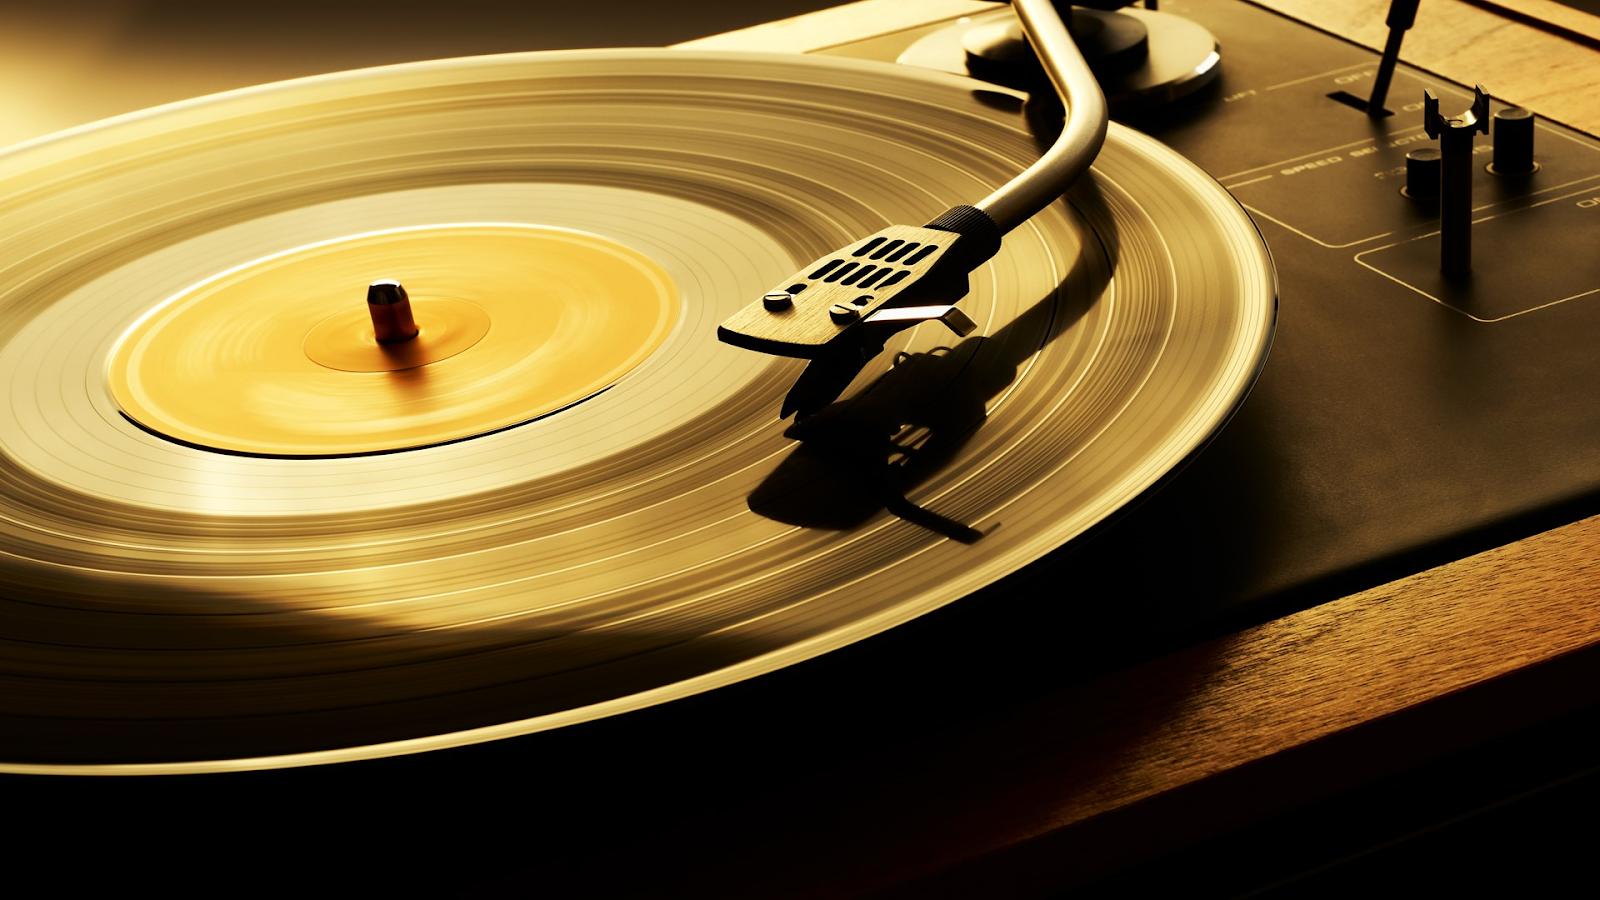 Download-Visions-of-Vinyl-Tema-Windows-10